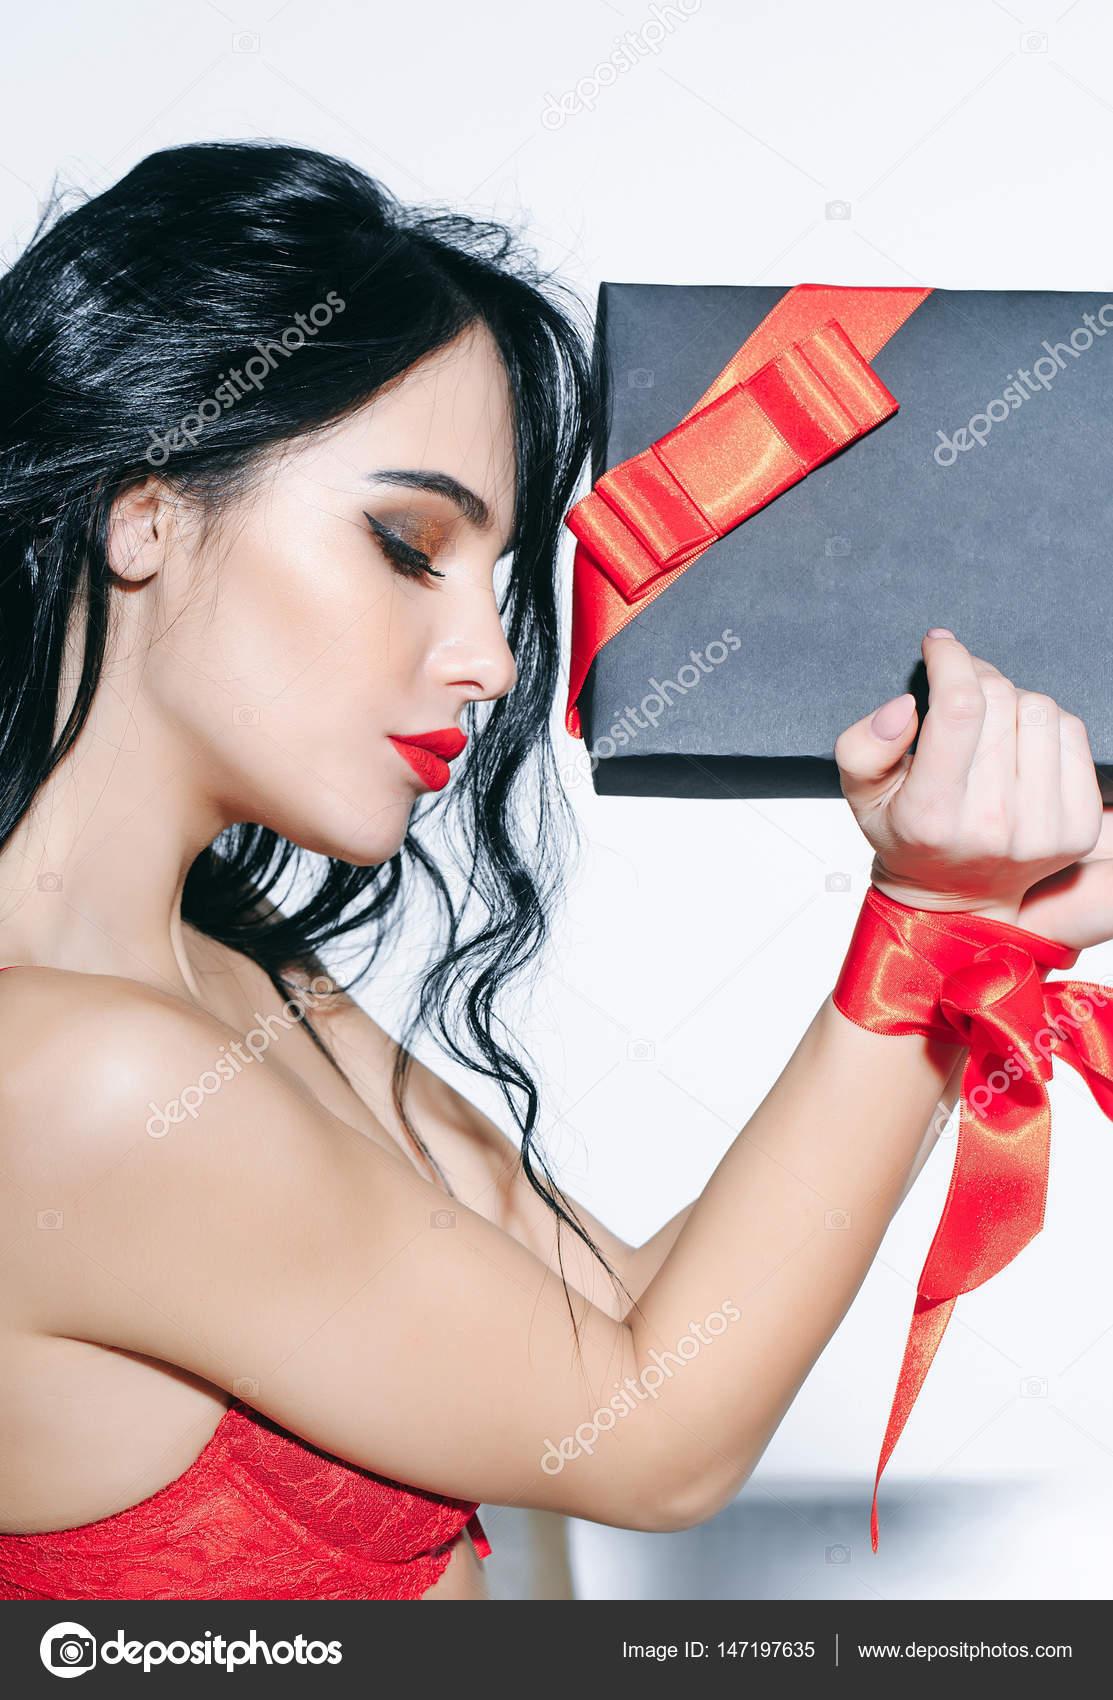 Pack De Chicas Con Cabello Largo Mujer Sexy Con Labios